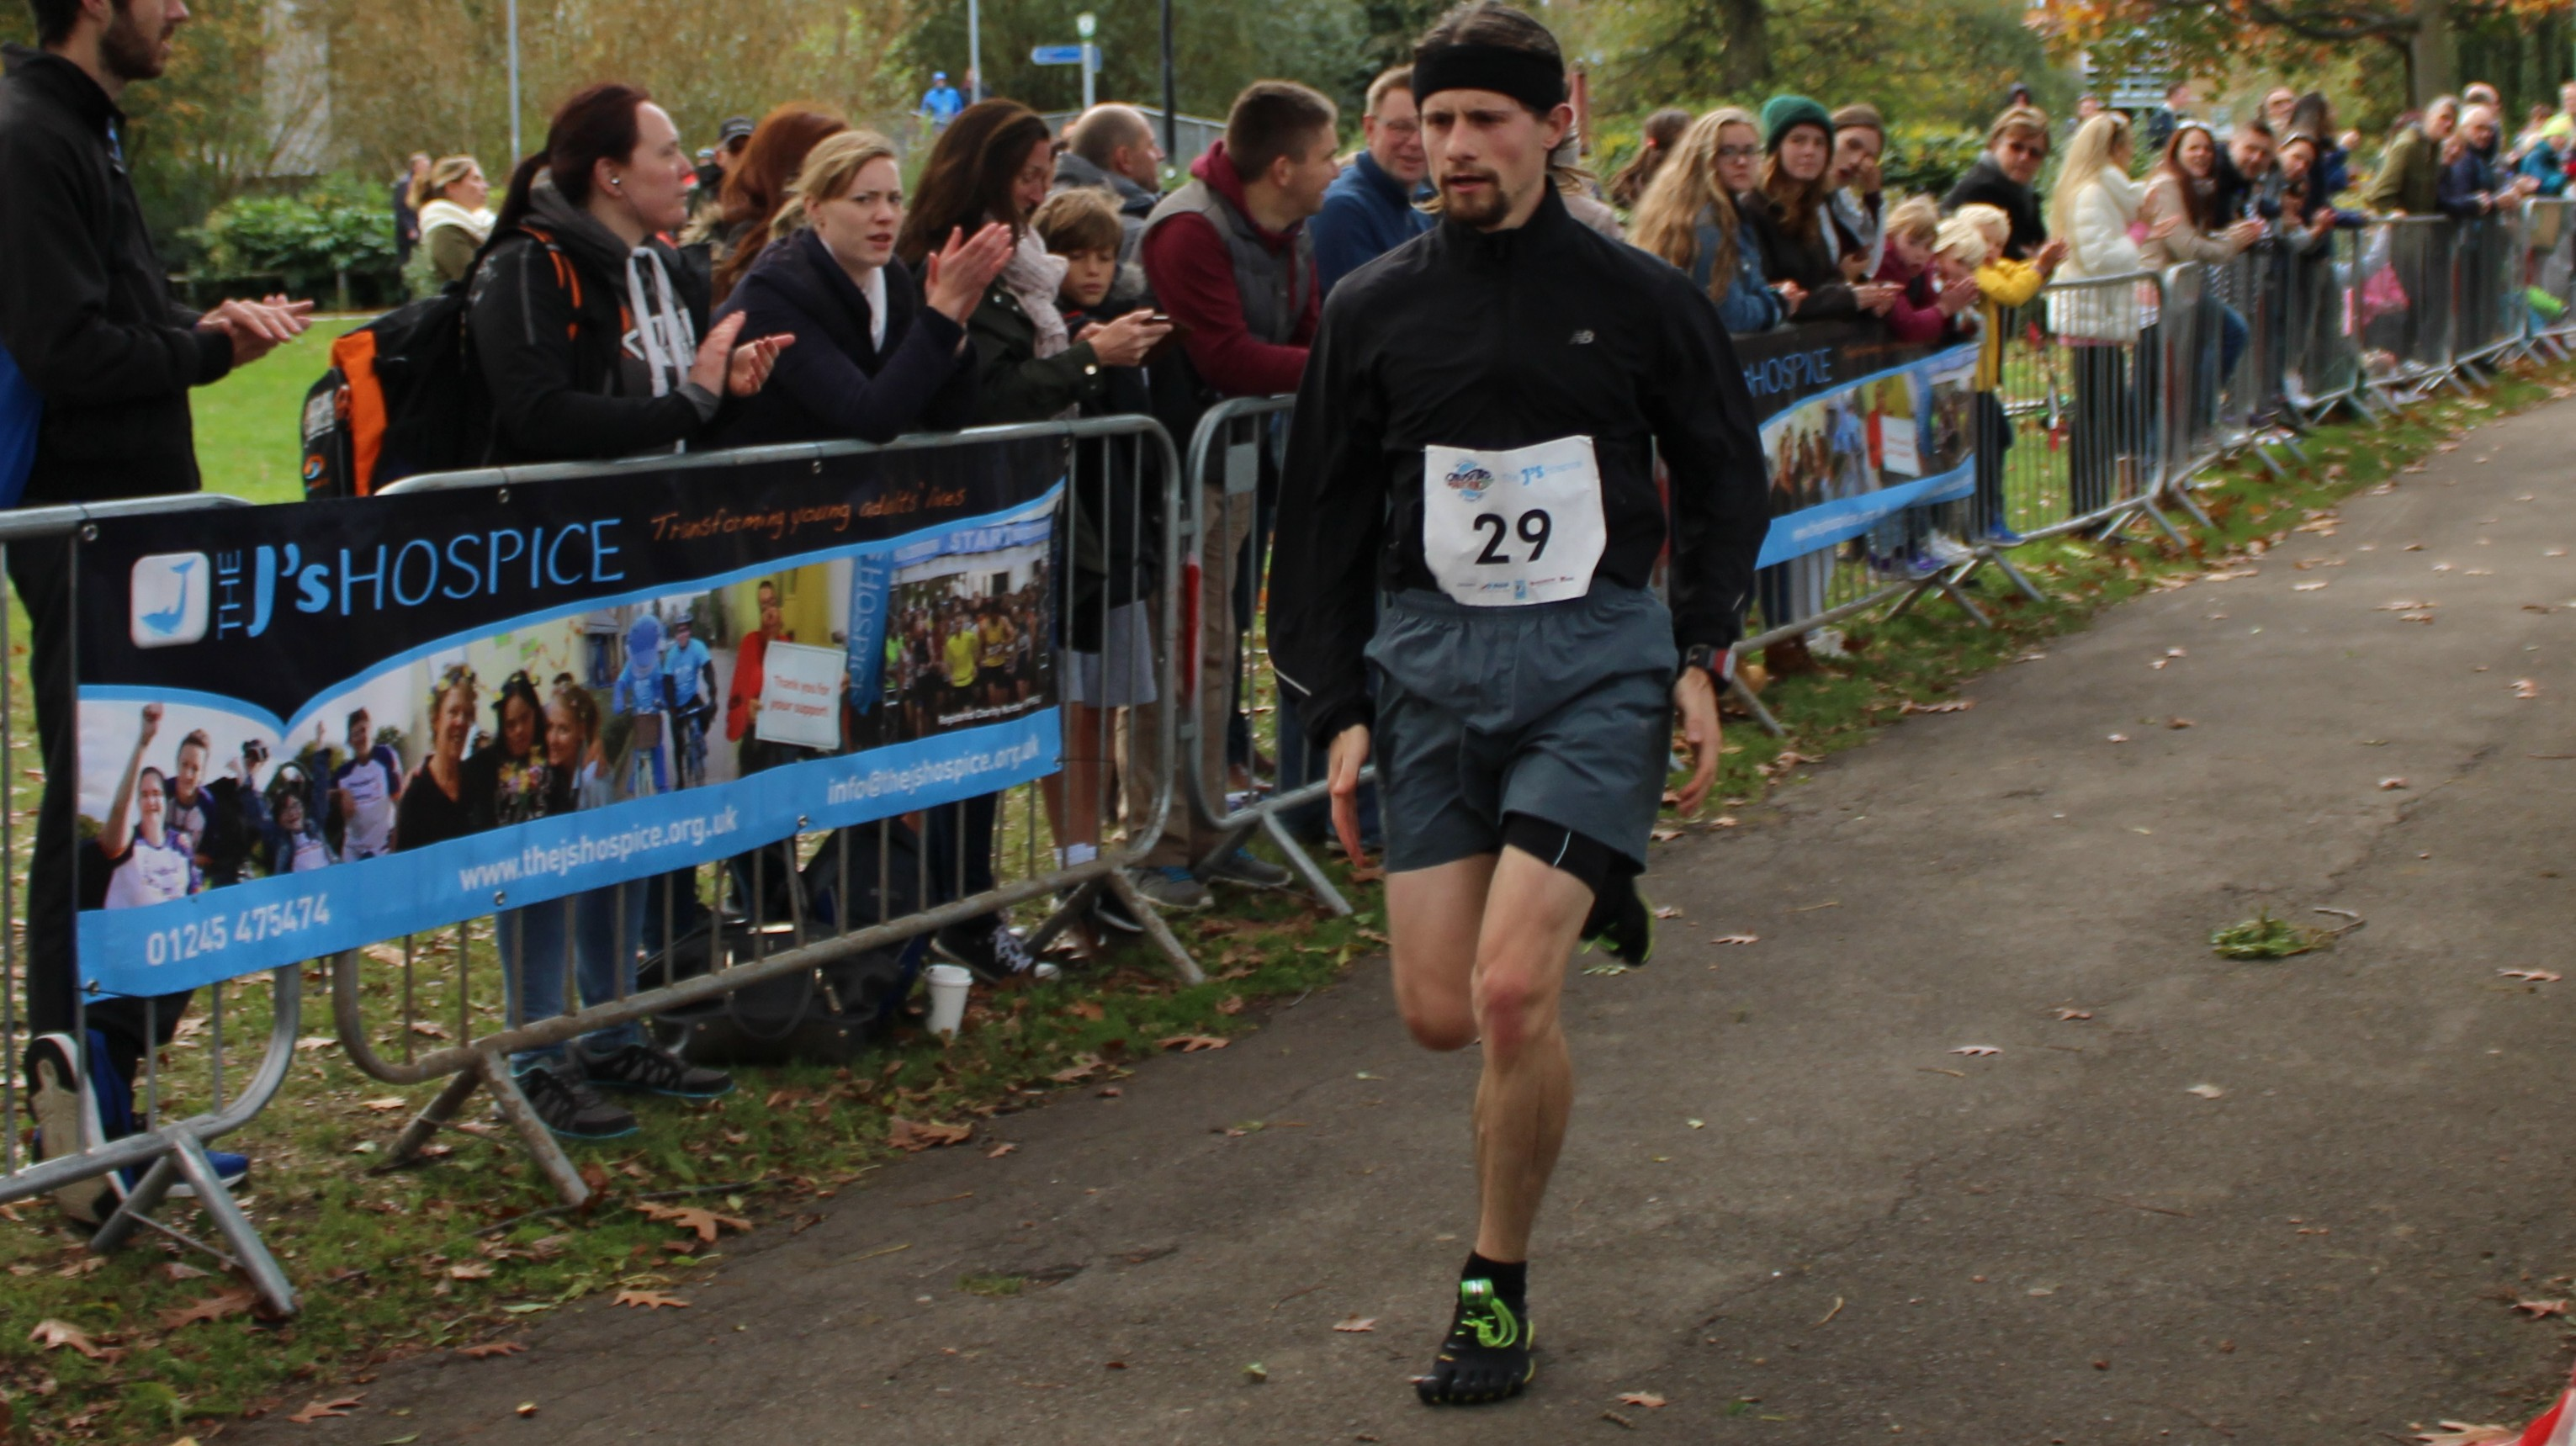 Chelmsford Marathon 2017 Finish